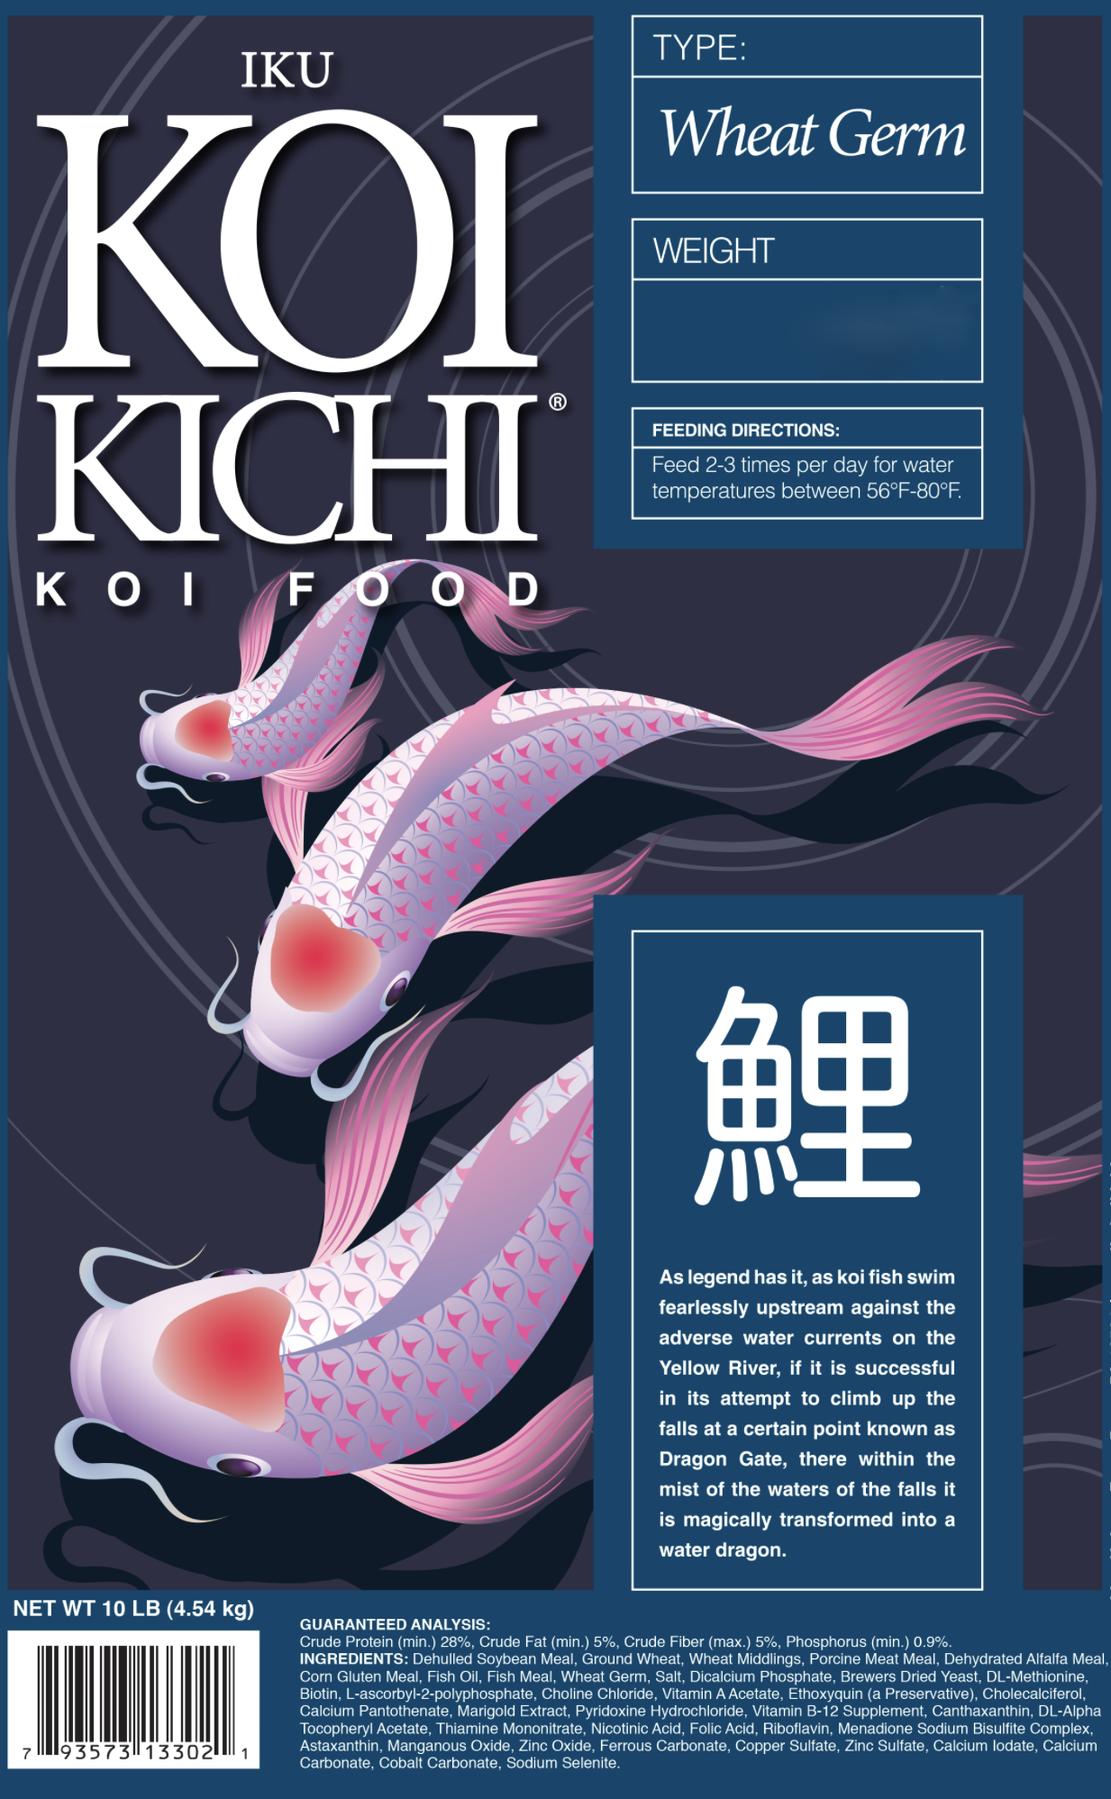 Iku Koi Kichi Wheat Germ Koi Fish Food - 5 lbs.